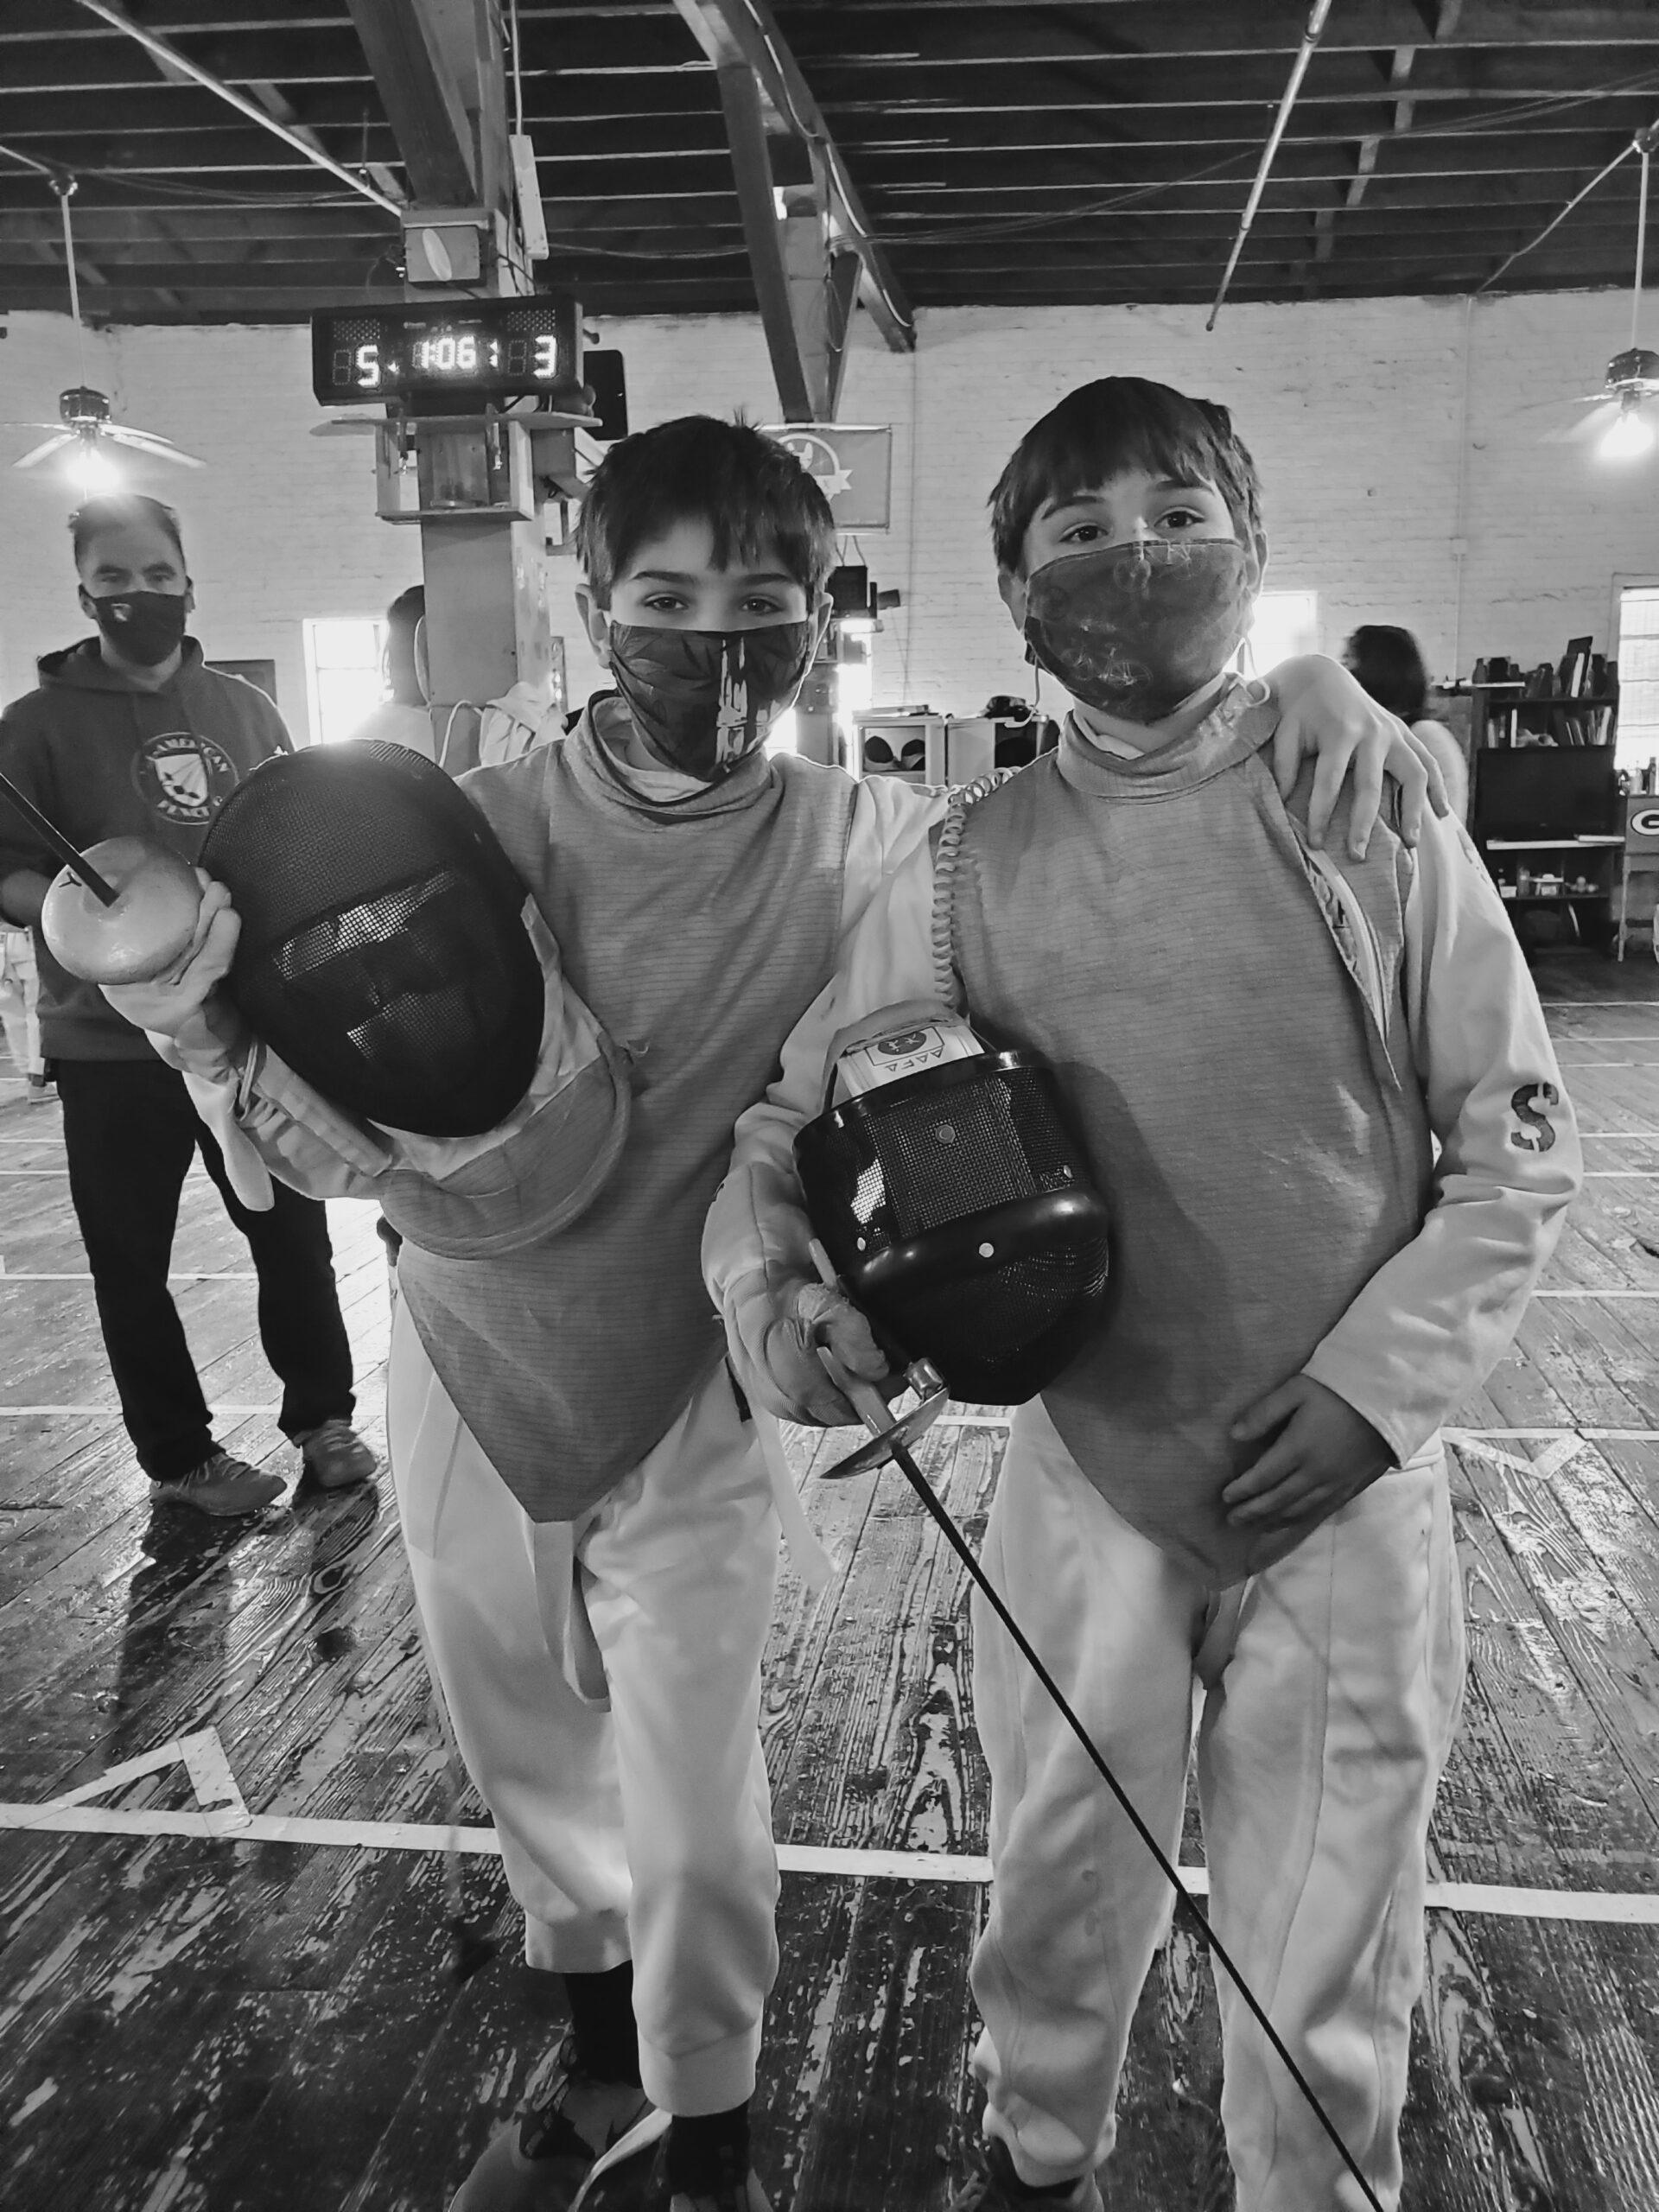 hoyt and atticus fencing tournament